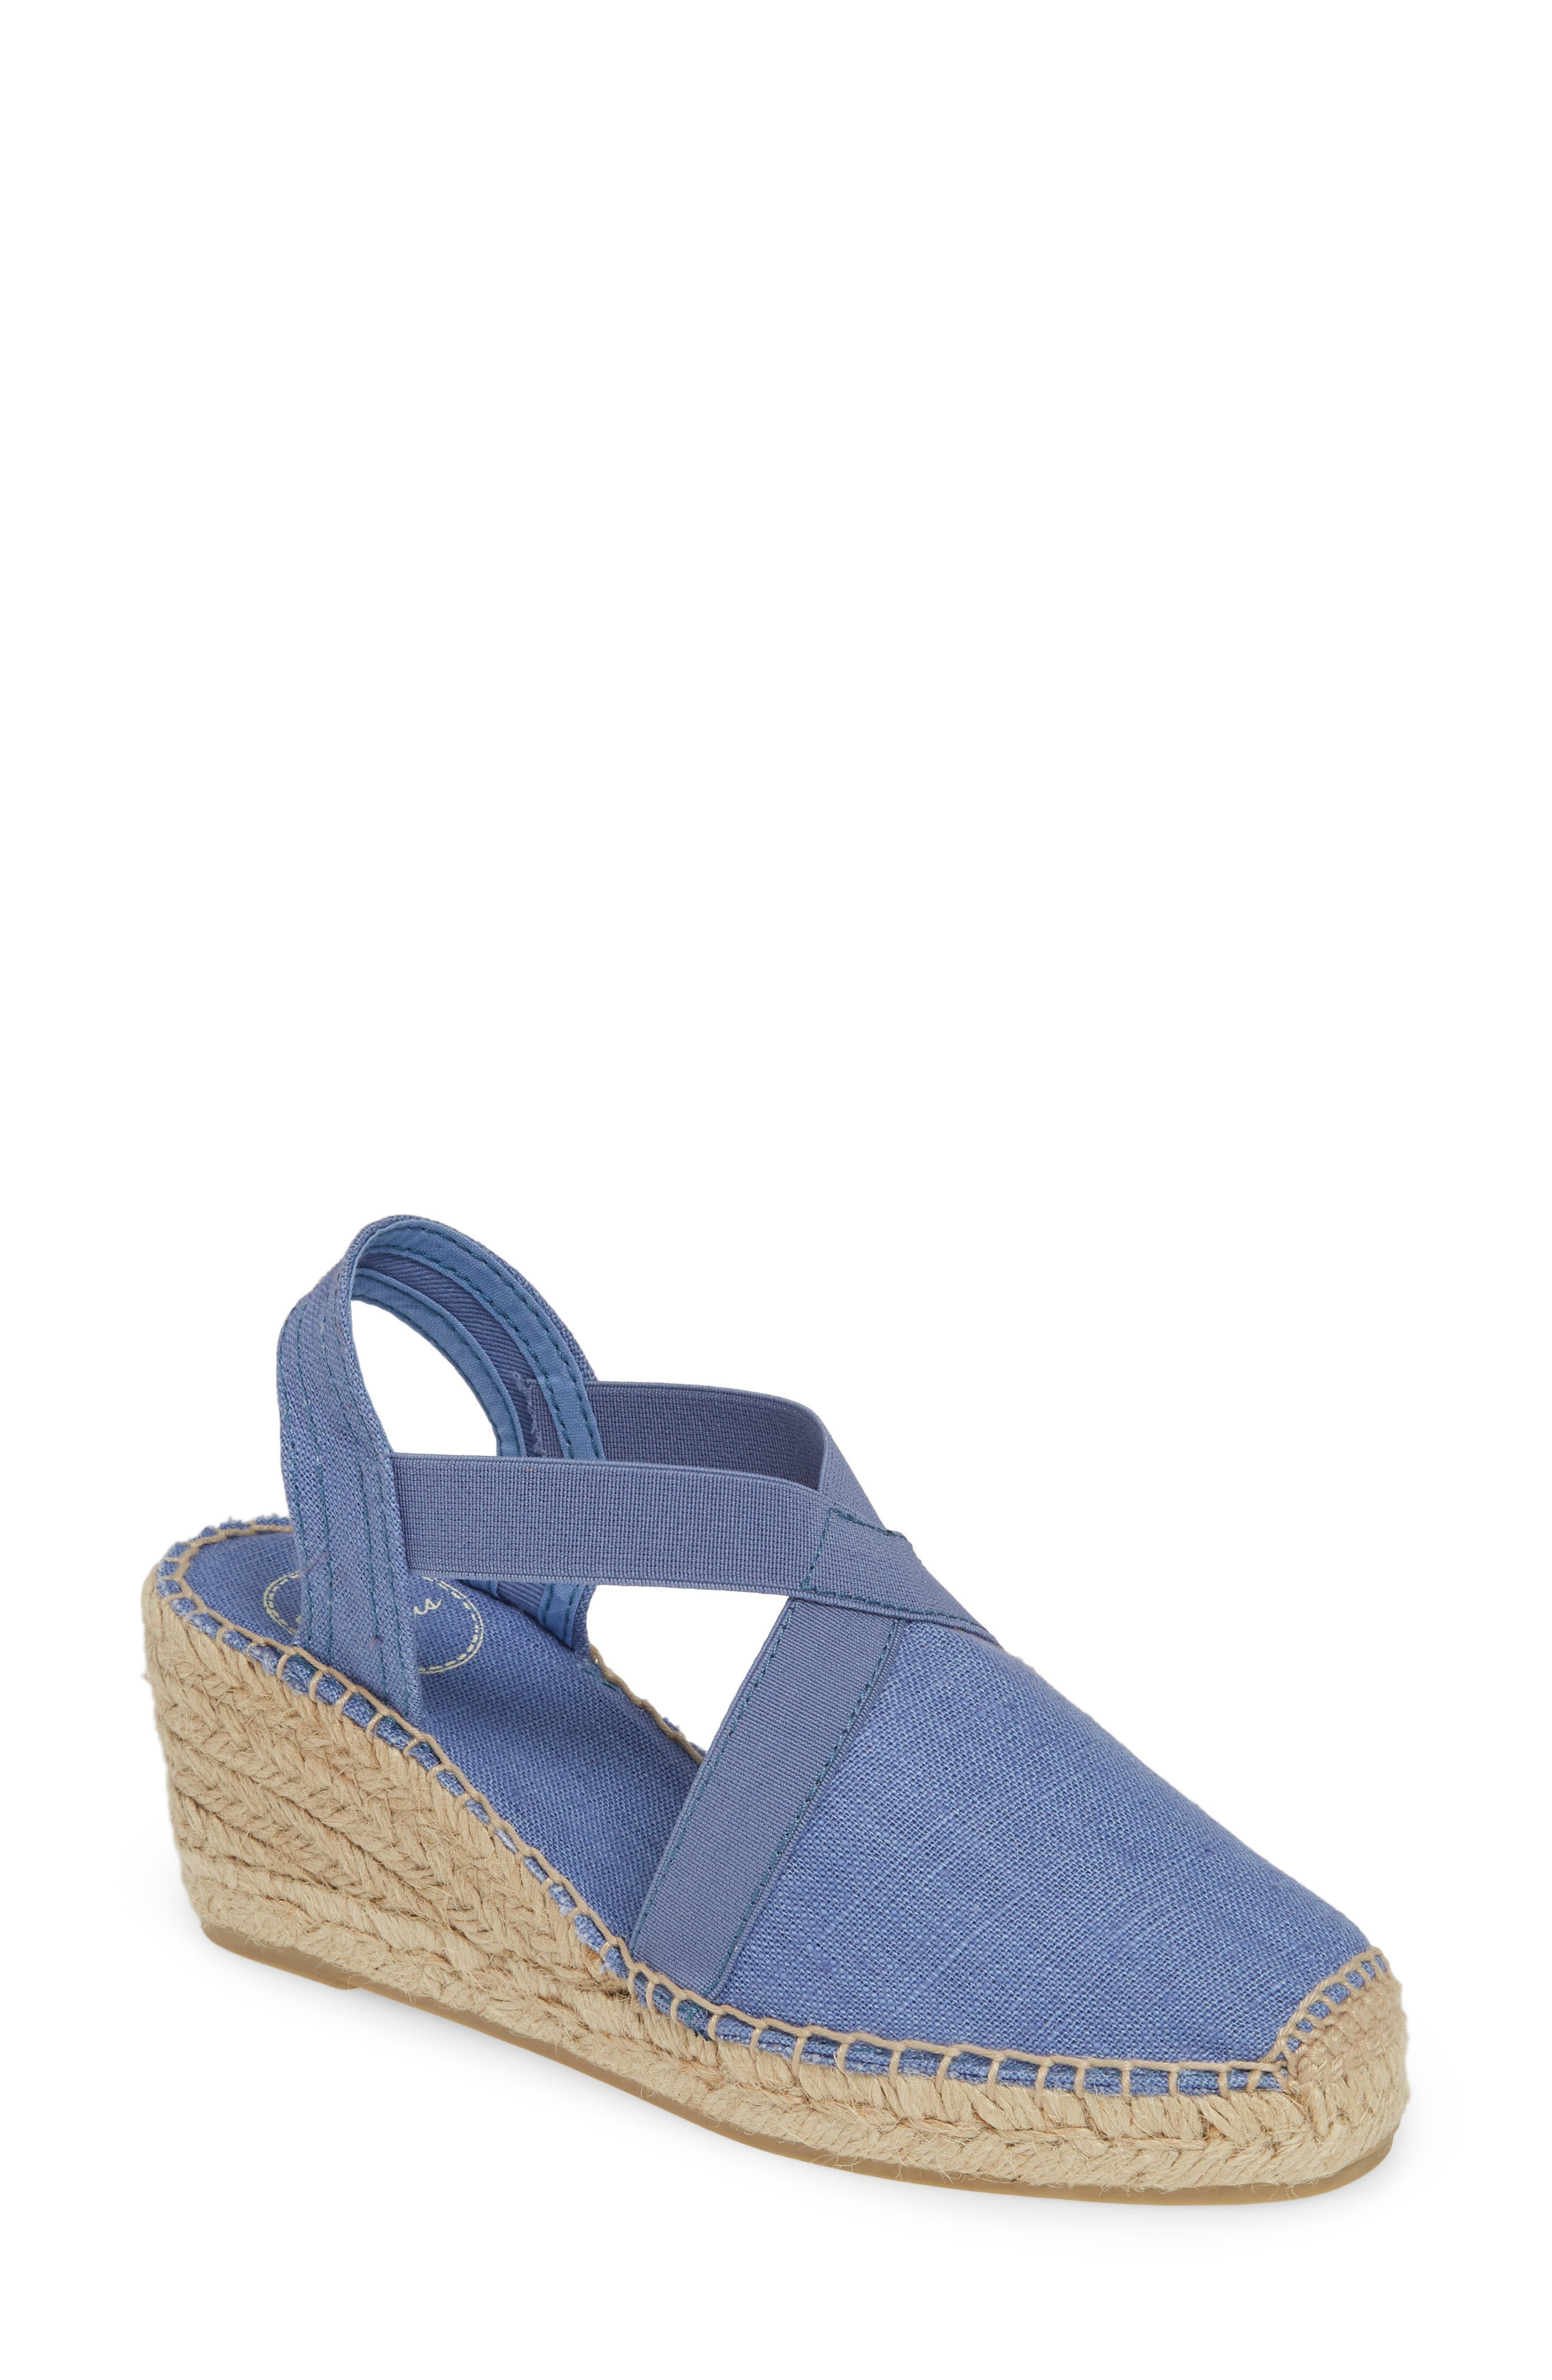 TONI PONS 'Ter' Slingback Espadrille Sandal, Main, color, ULTRAMARINE FABRIC